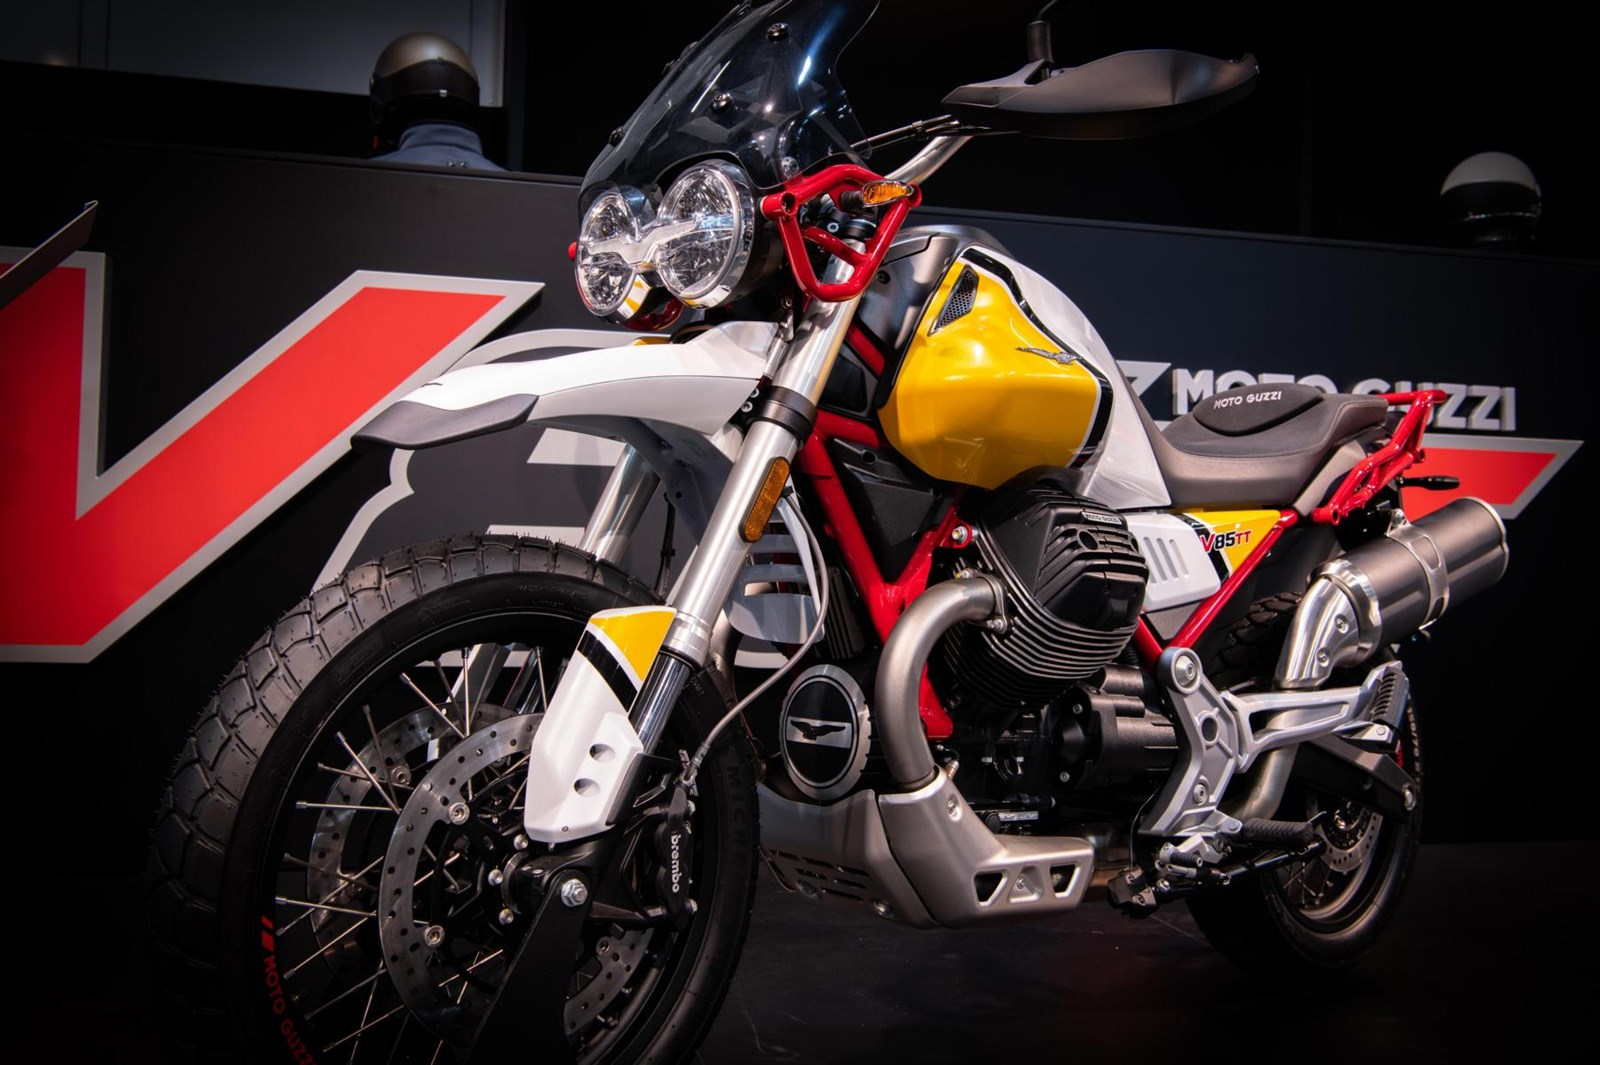 Moto Guzzi_V85 TT (3 von 11)-30.JPG